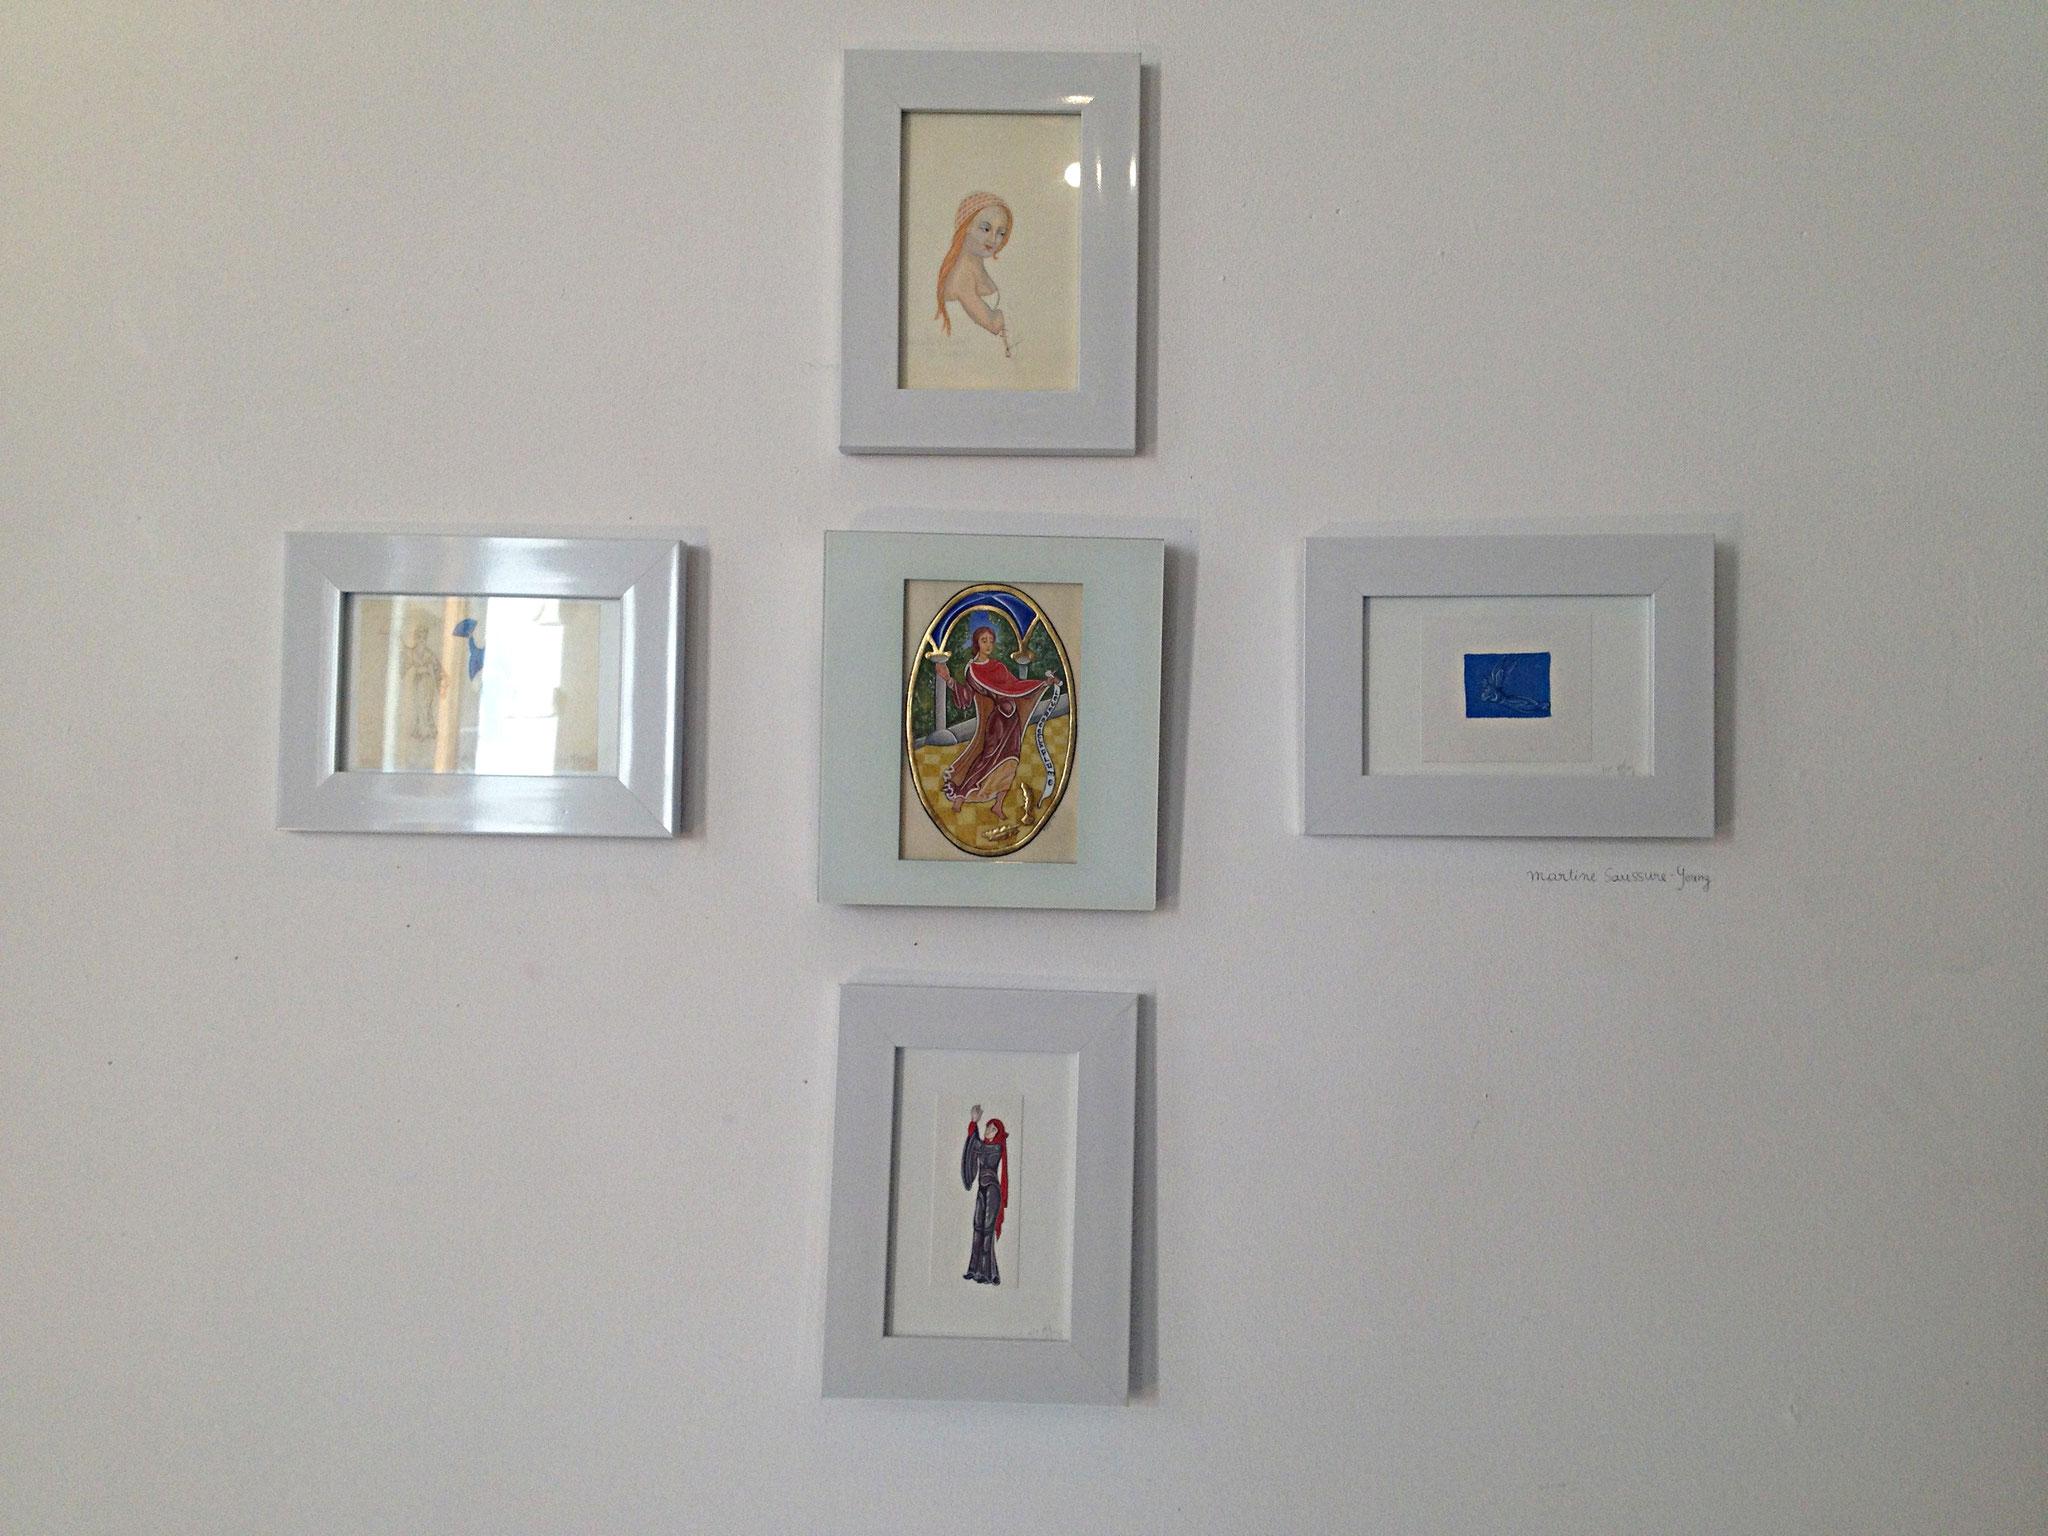 Miniatures de Martine Saussure-Young